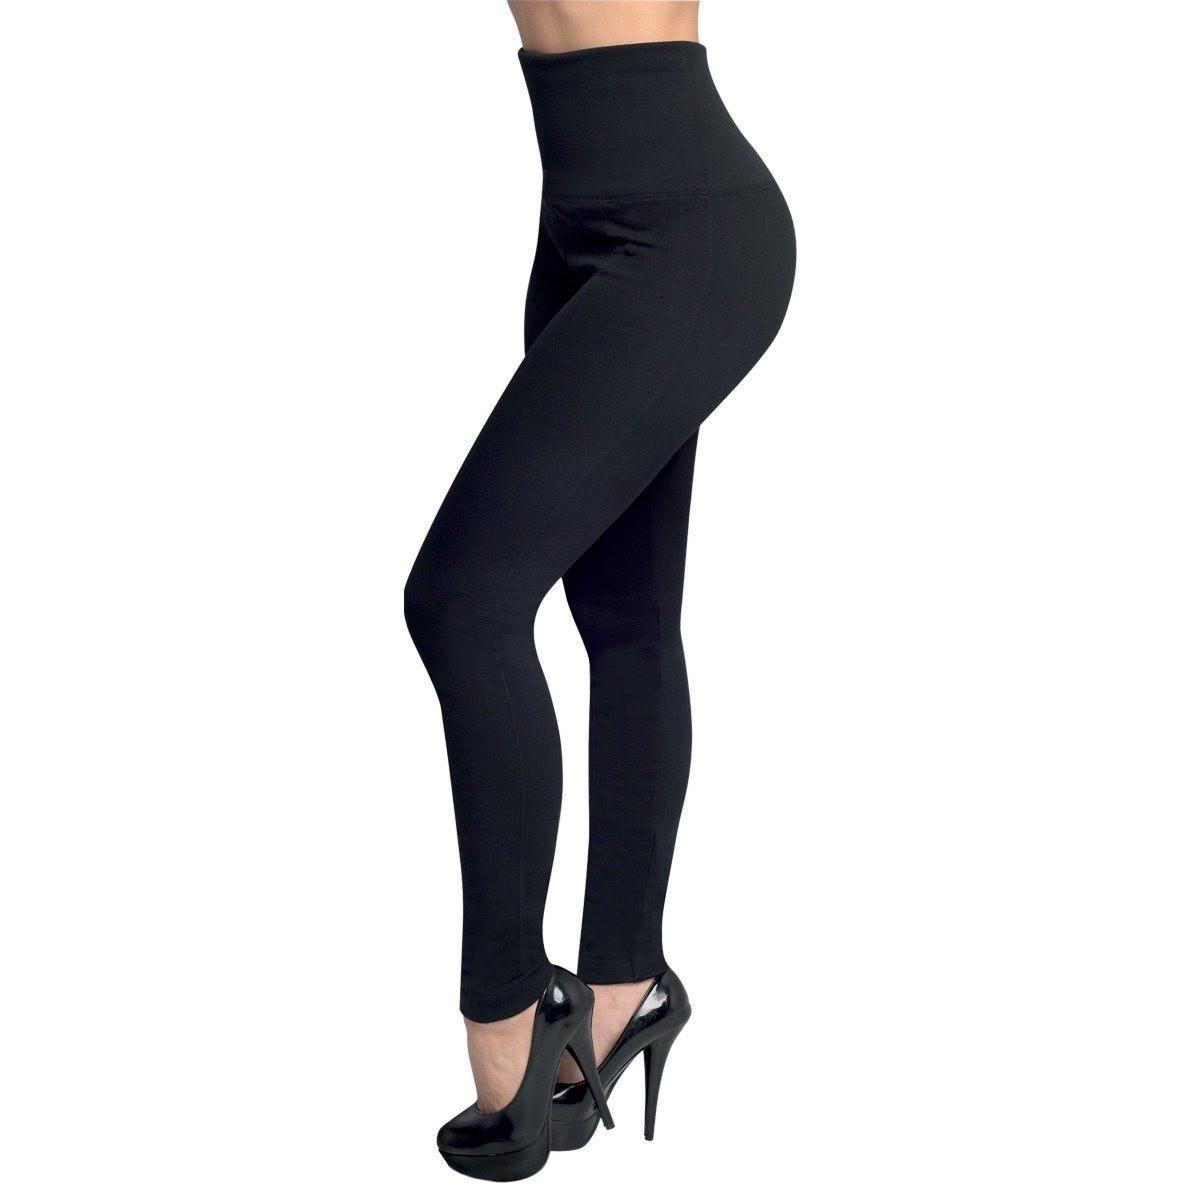 JML Hollywood Pants Shapewear Leggings